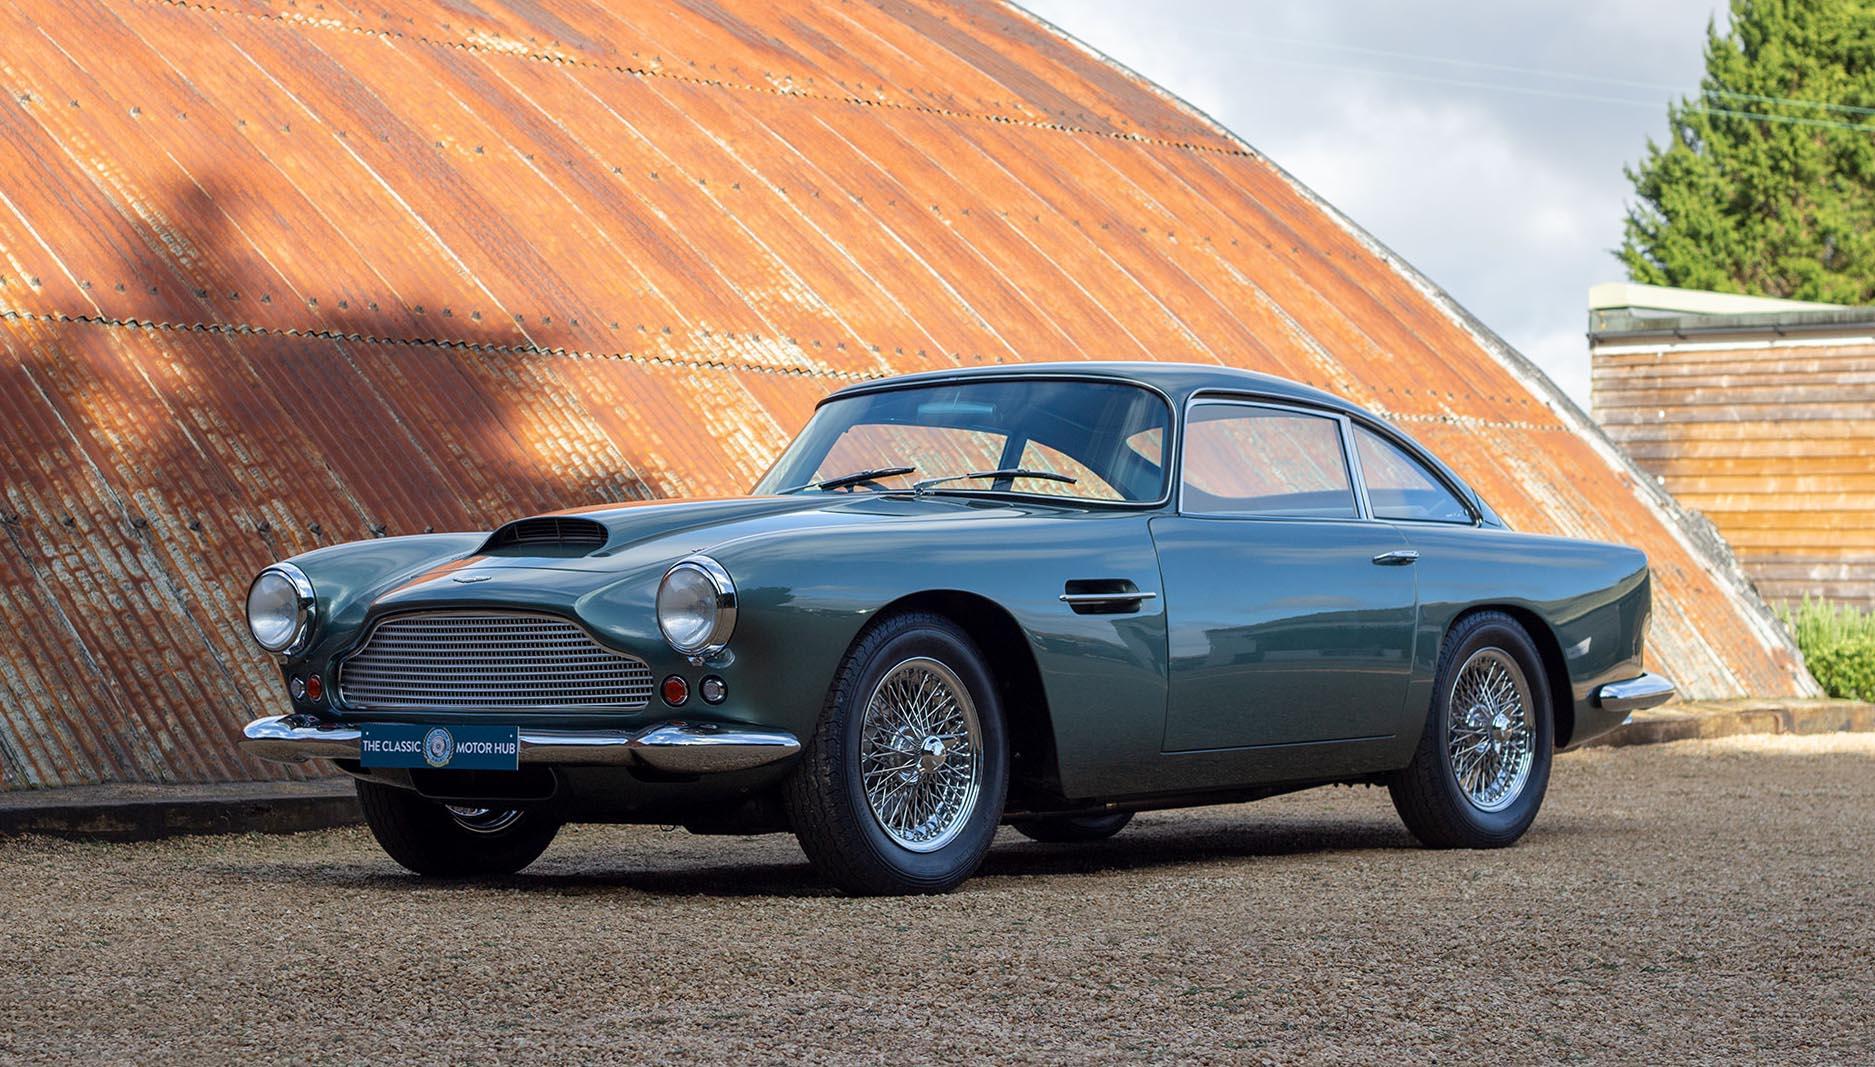 1961 Aston Martin DB4 S3 for sale